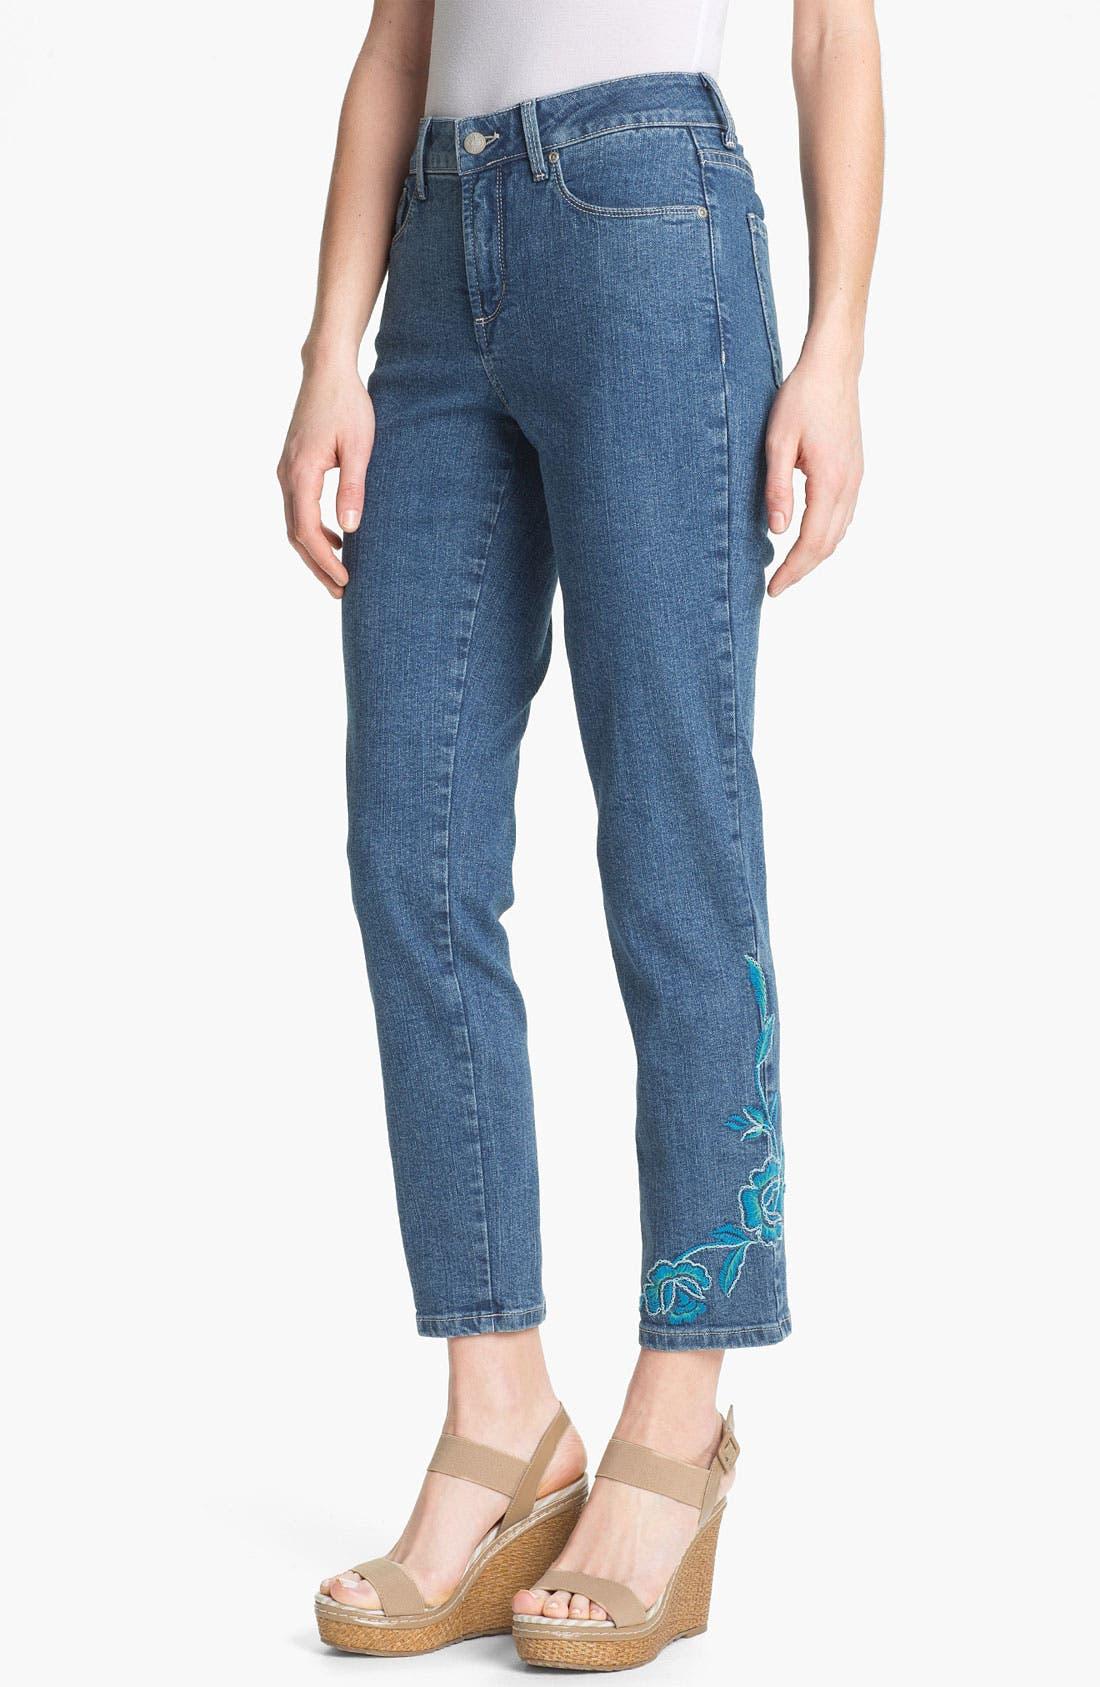 Main Image - NYDJ 'Alisha' Embroidered Skinny Stretch Ankle Jeans